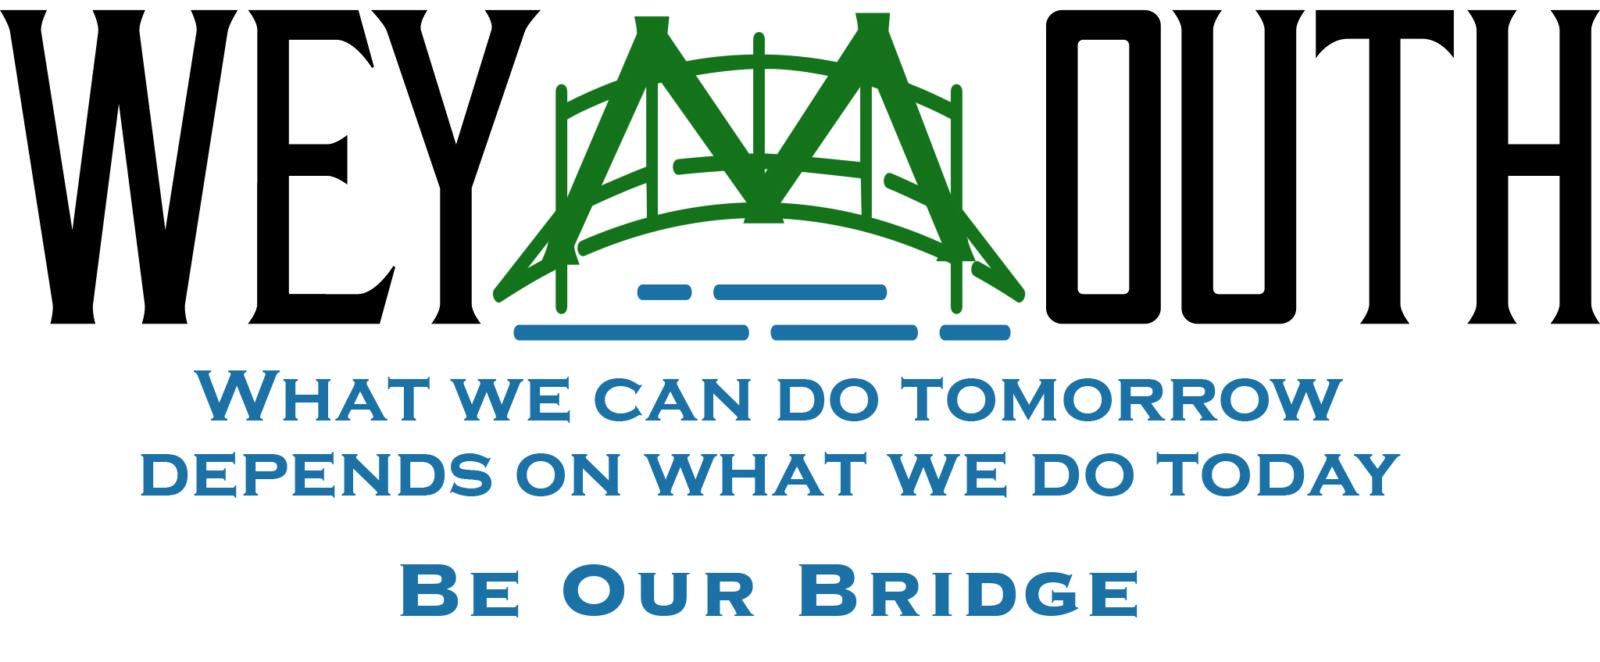 Weymouth BRIDGE logo